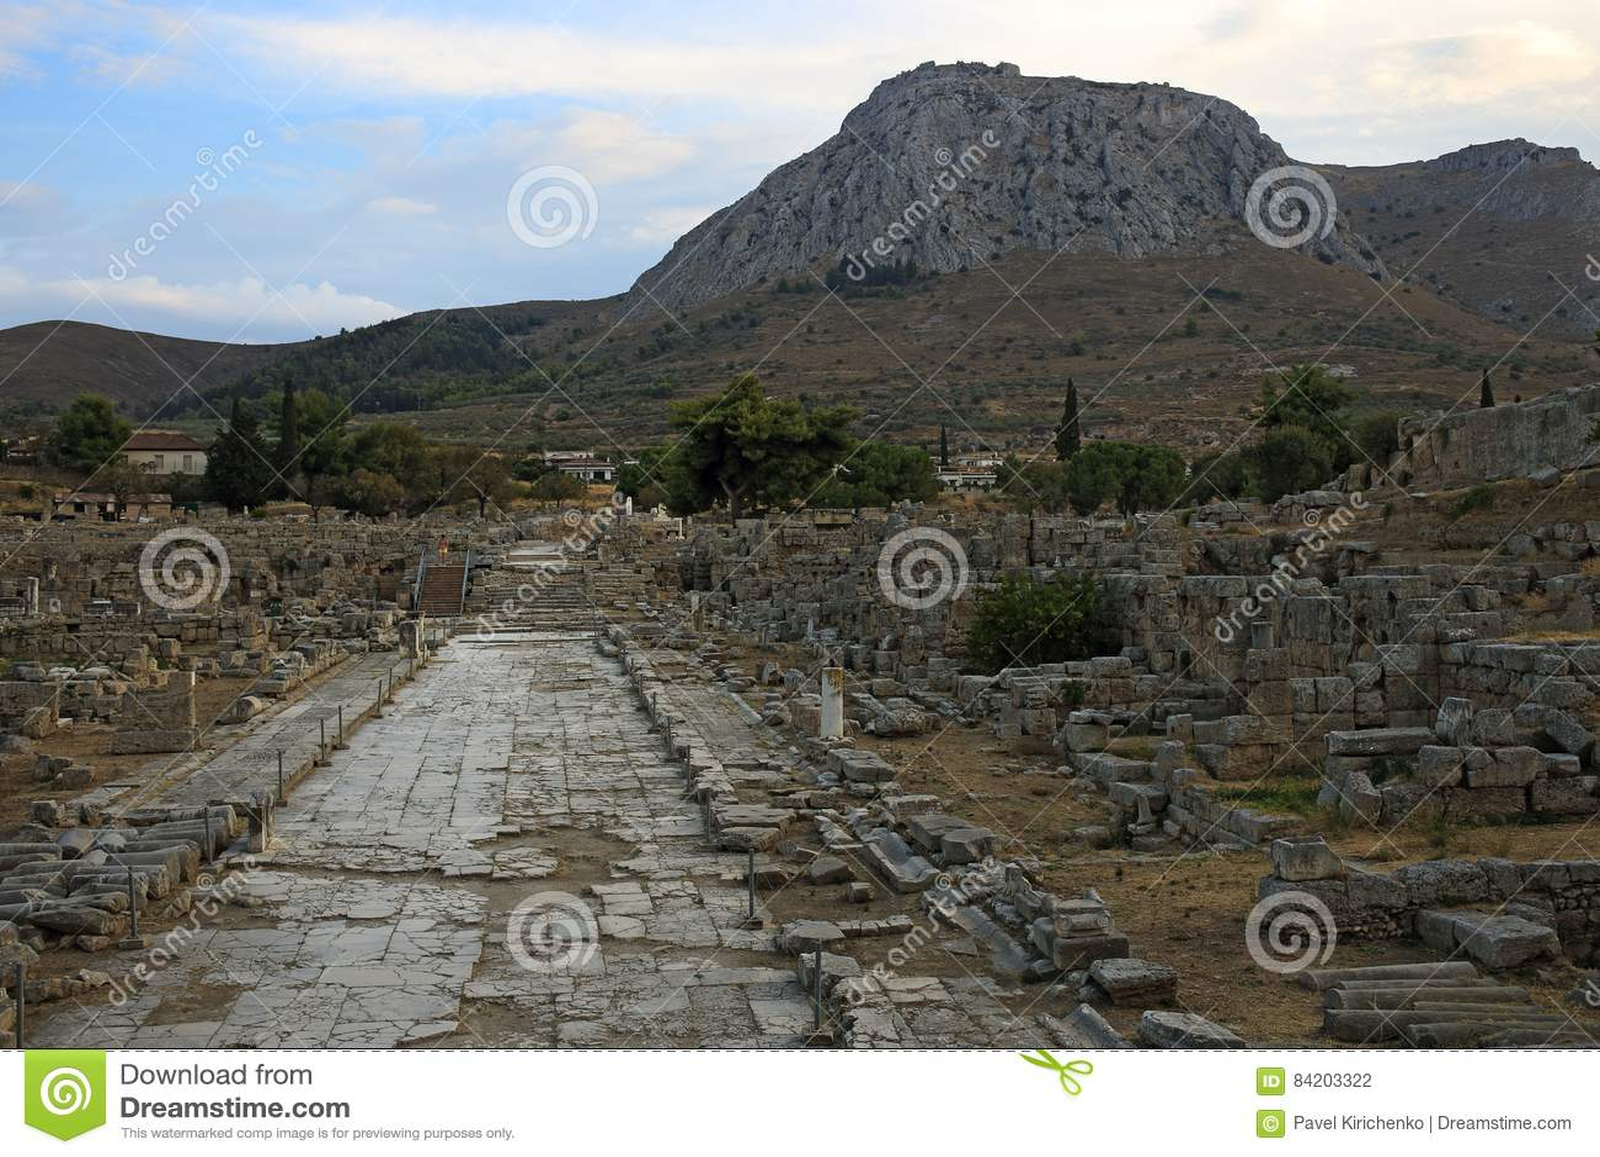 Lechaio road in Ancient Corinth, Greece